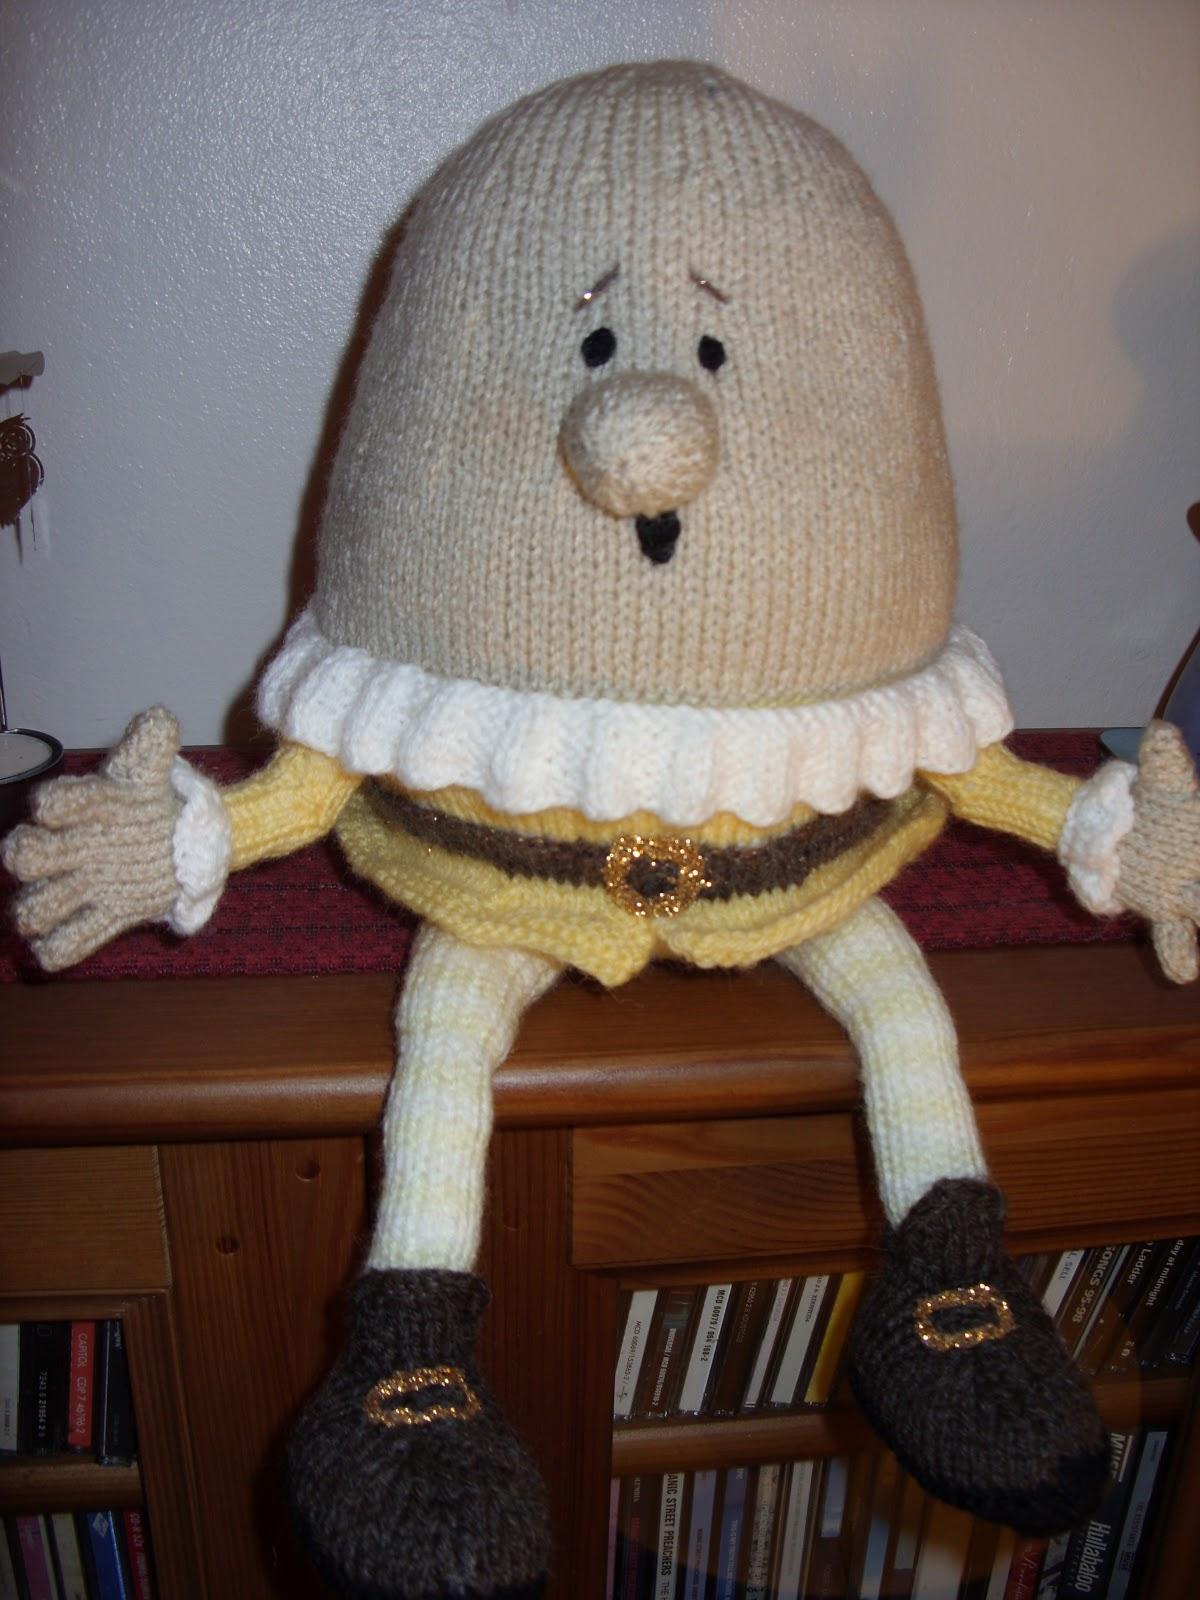 Humpty Dumpty Knitting Pattern : Simple Beginnings: Knitted Humpty Dumpty